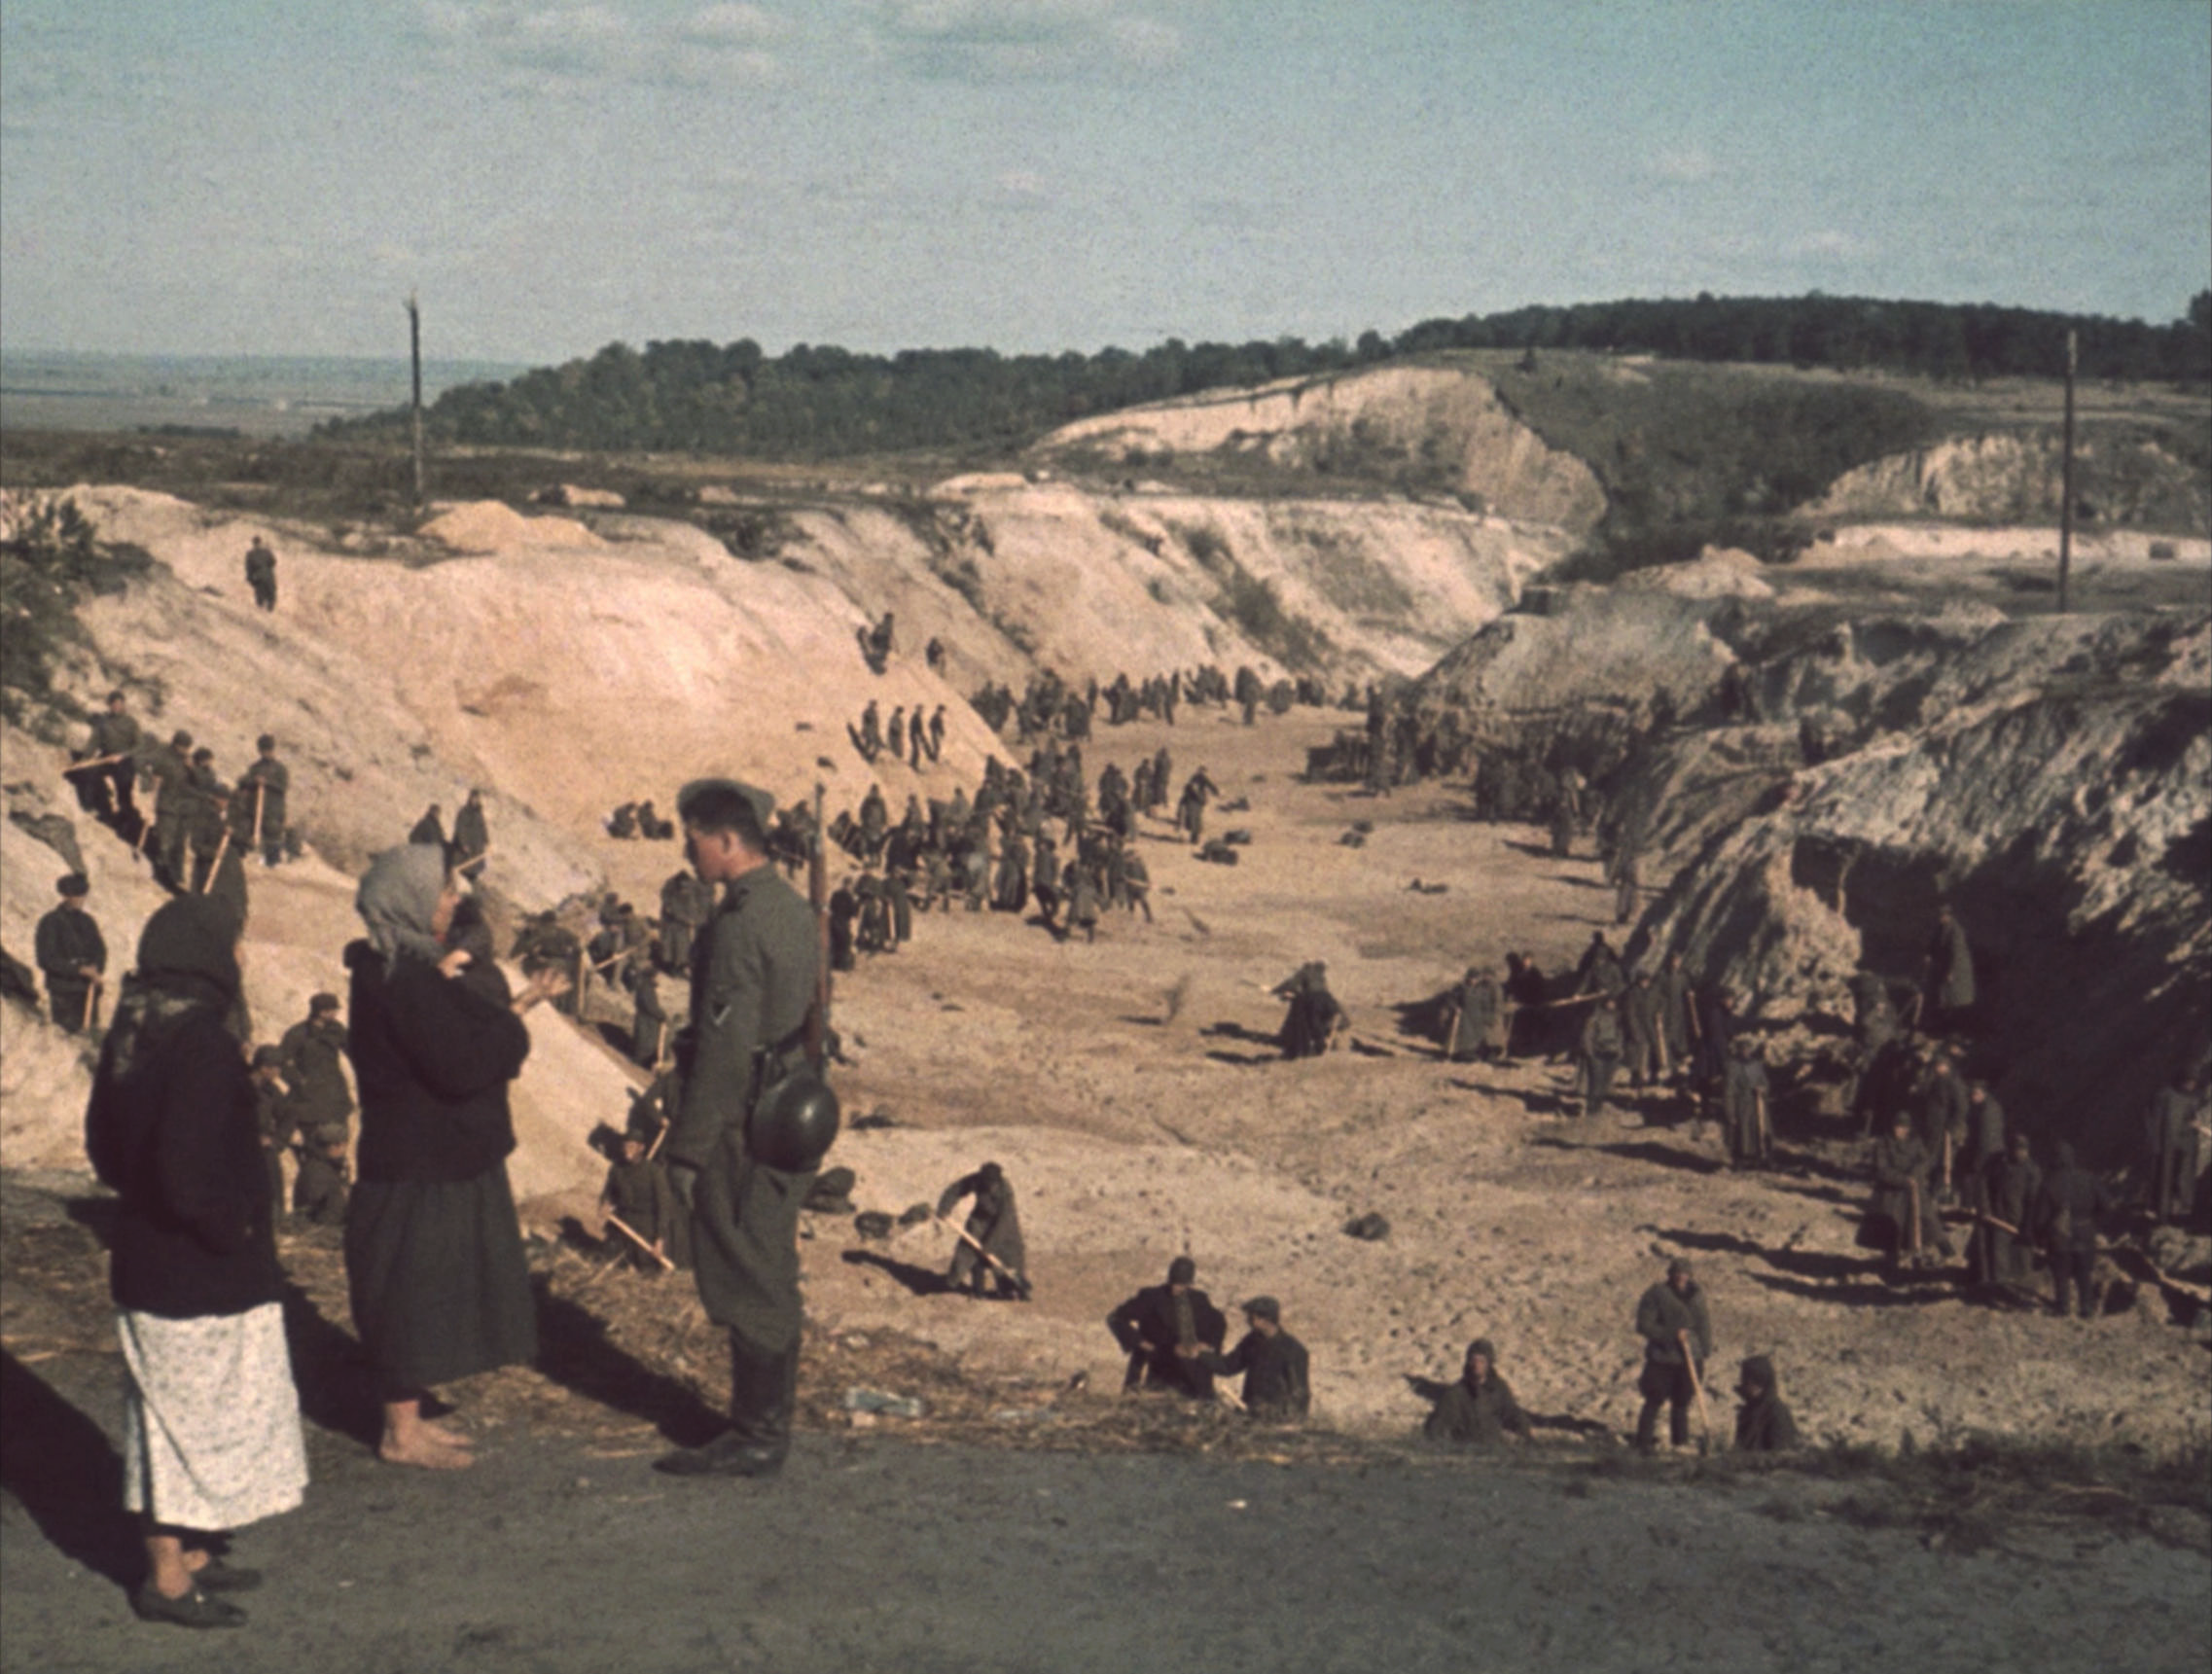 Soviet POWs covering a mass grave after the Babi Yar massacre, October 1, 1941.